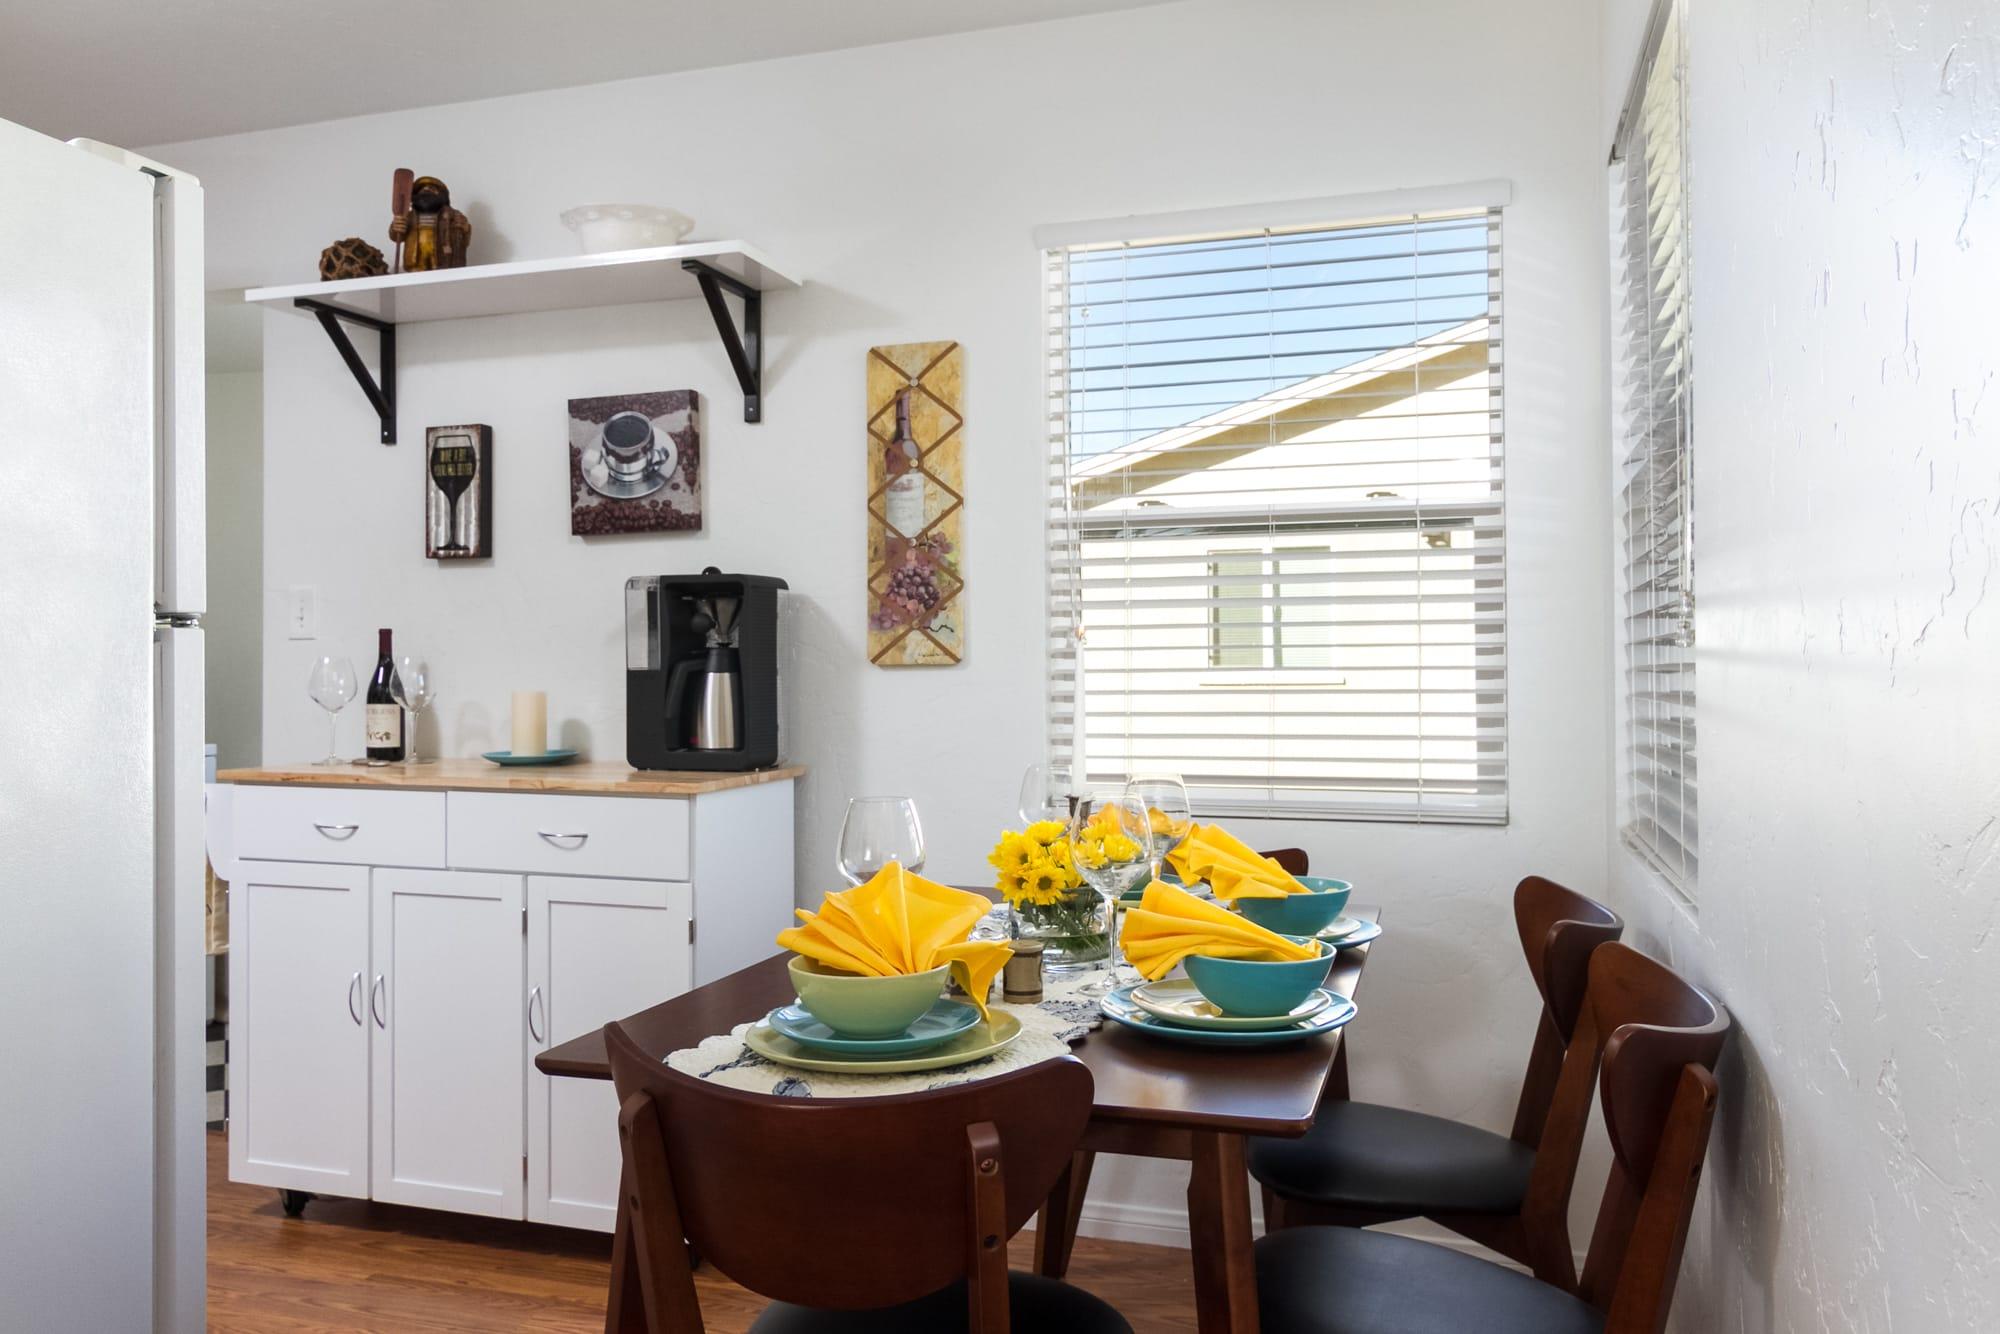 Dining Room | Dishware/Flatware Provided